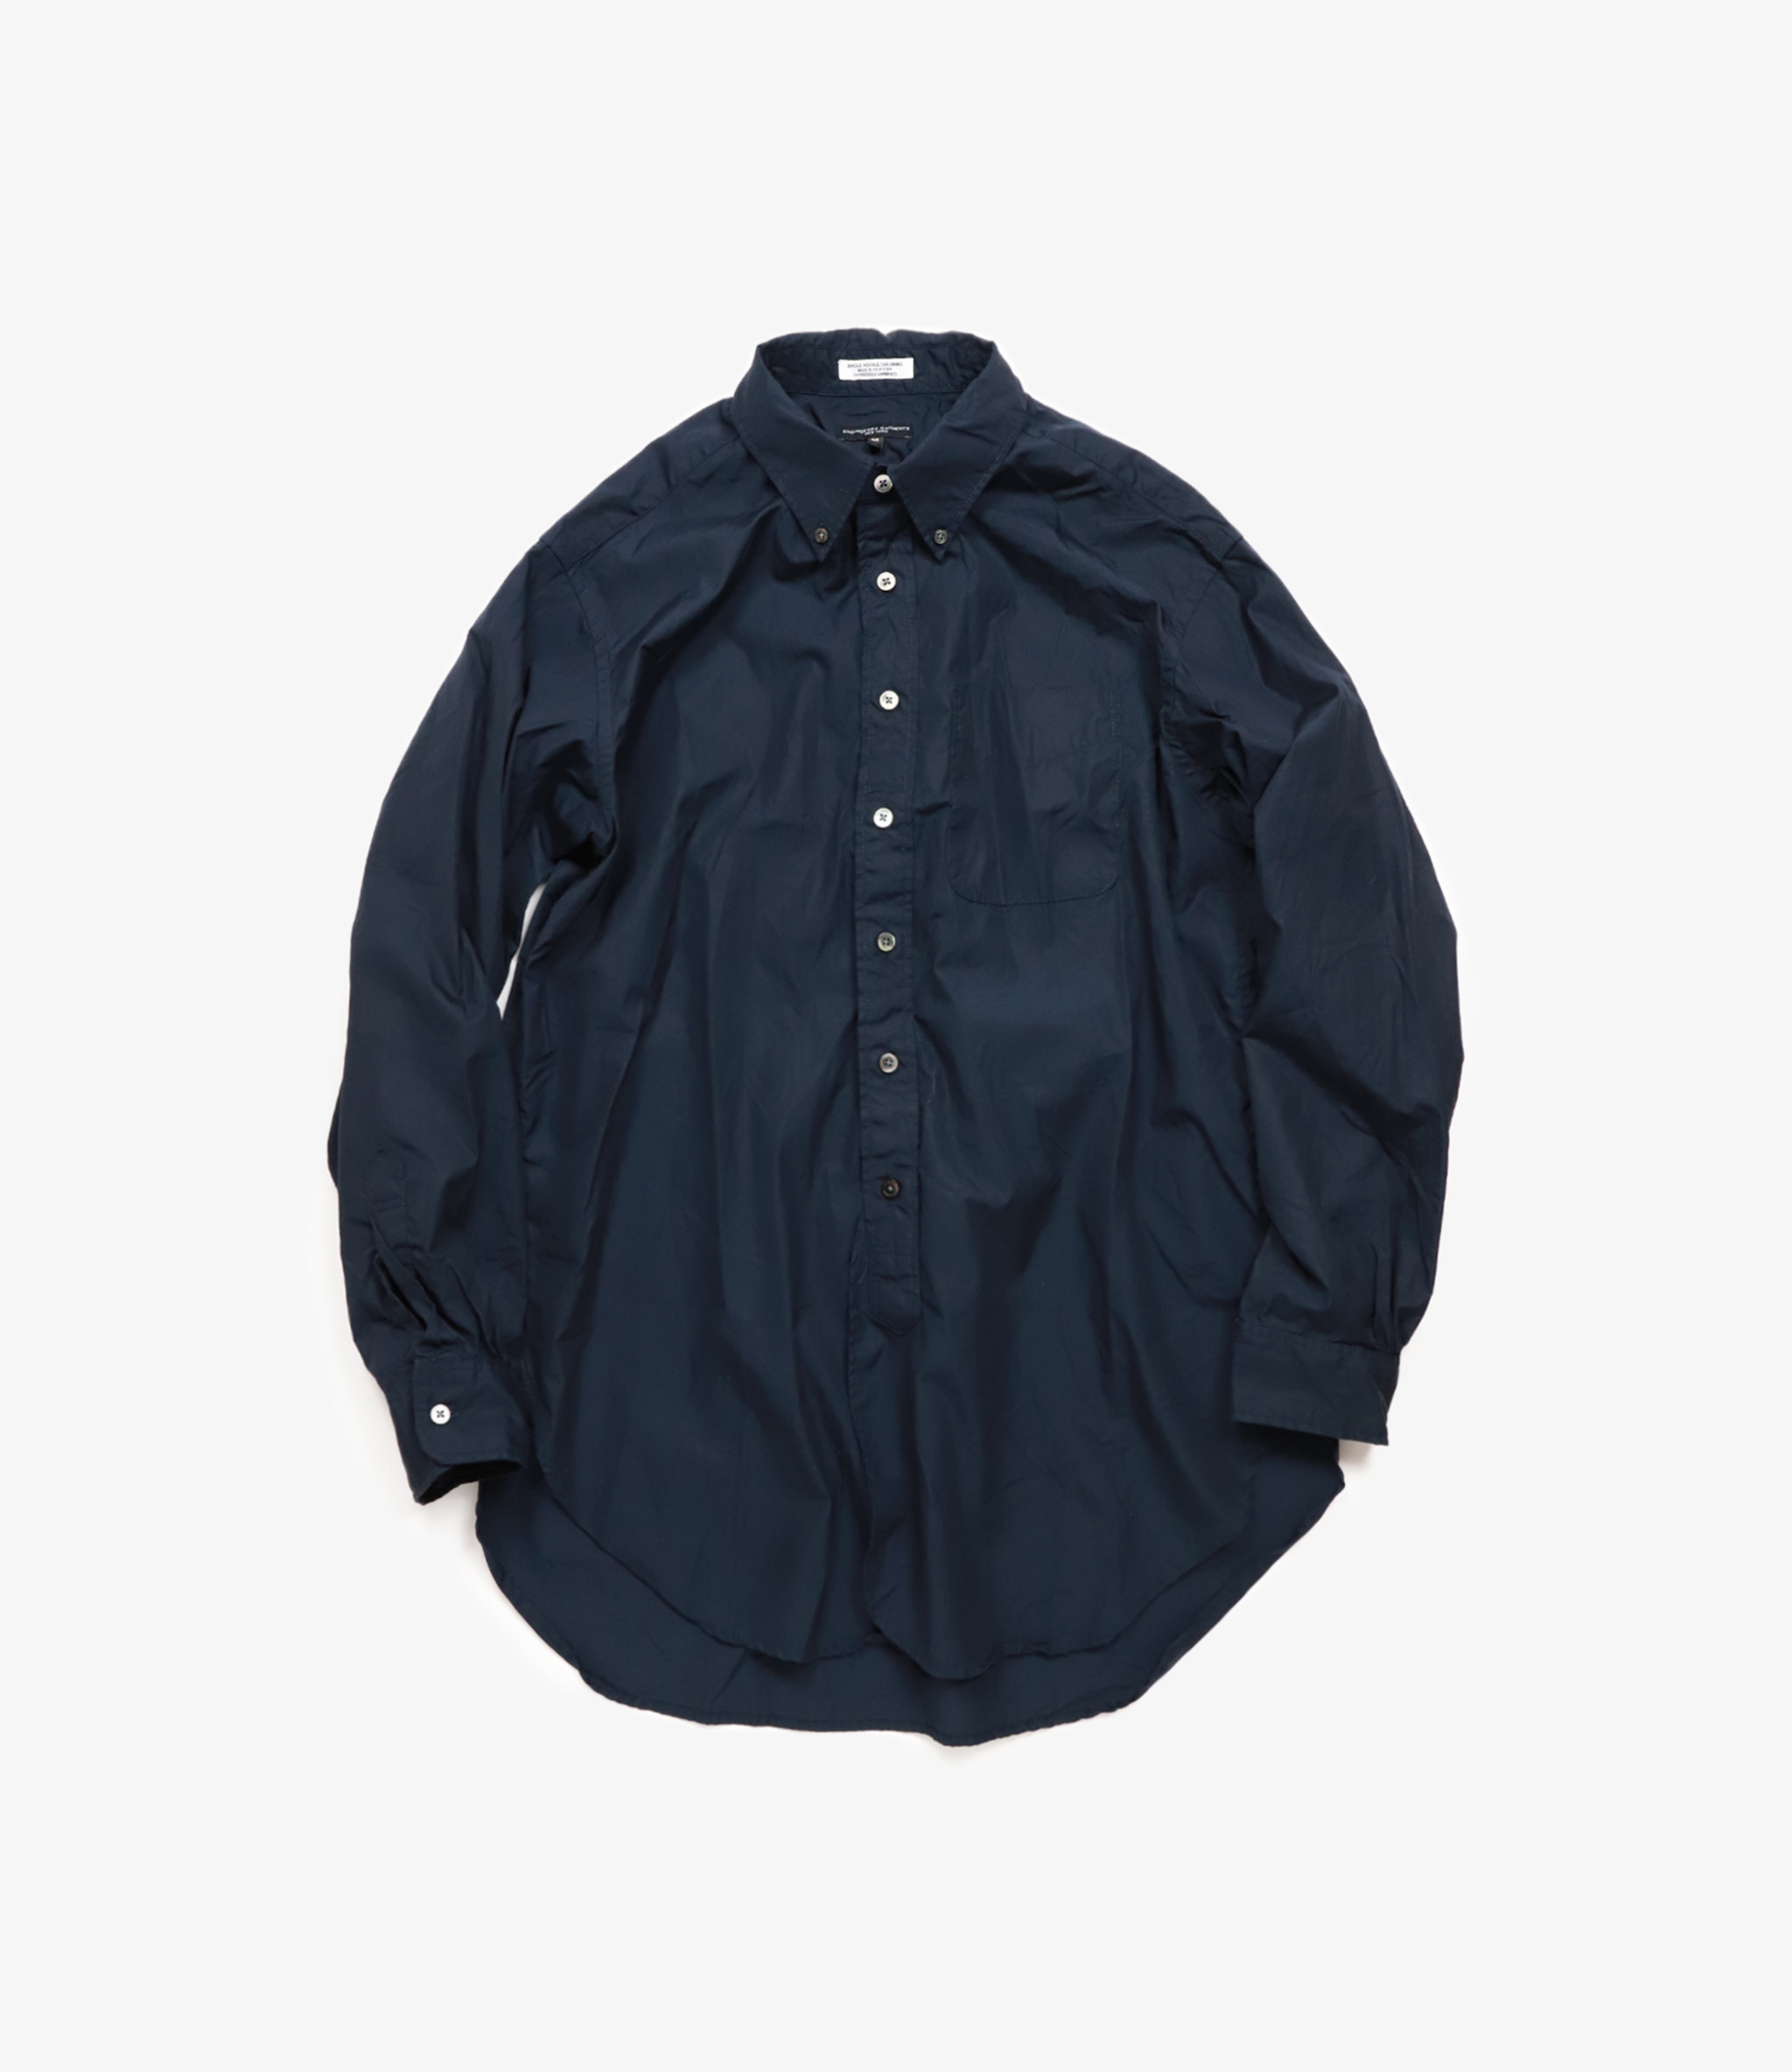 Engineered Garments 19 Century BD Shirt - Dark Navy 100's 2Ply Broadcloth